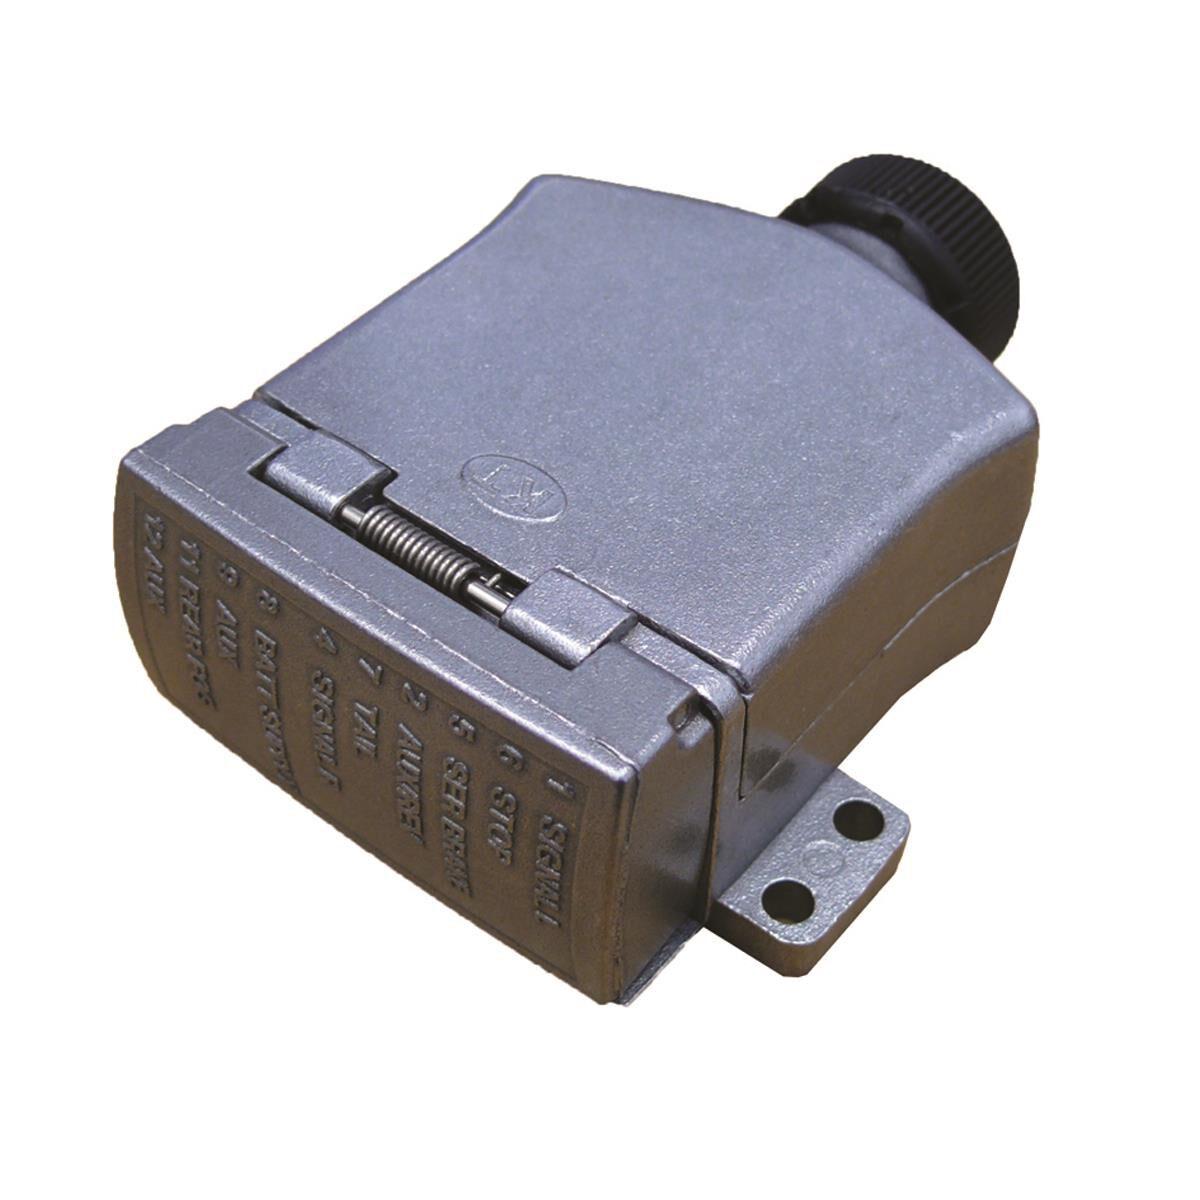 Wiring Harness Kit Nz Simple Diagram Adapter Trailer Diagrams Img Nissan Plugs Sockets